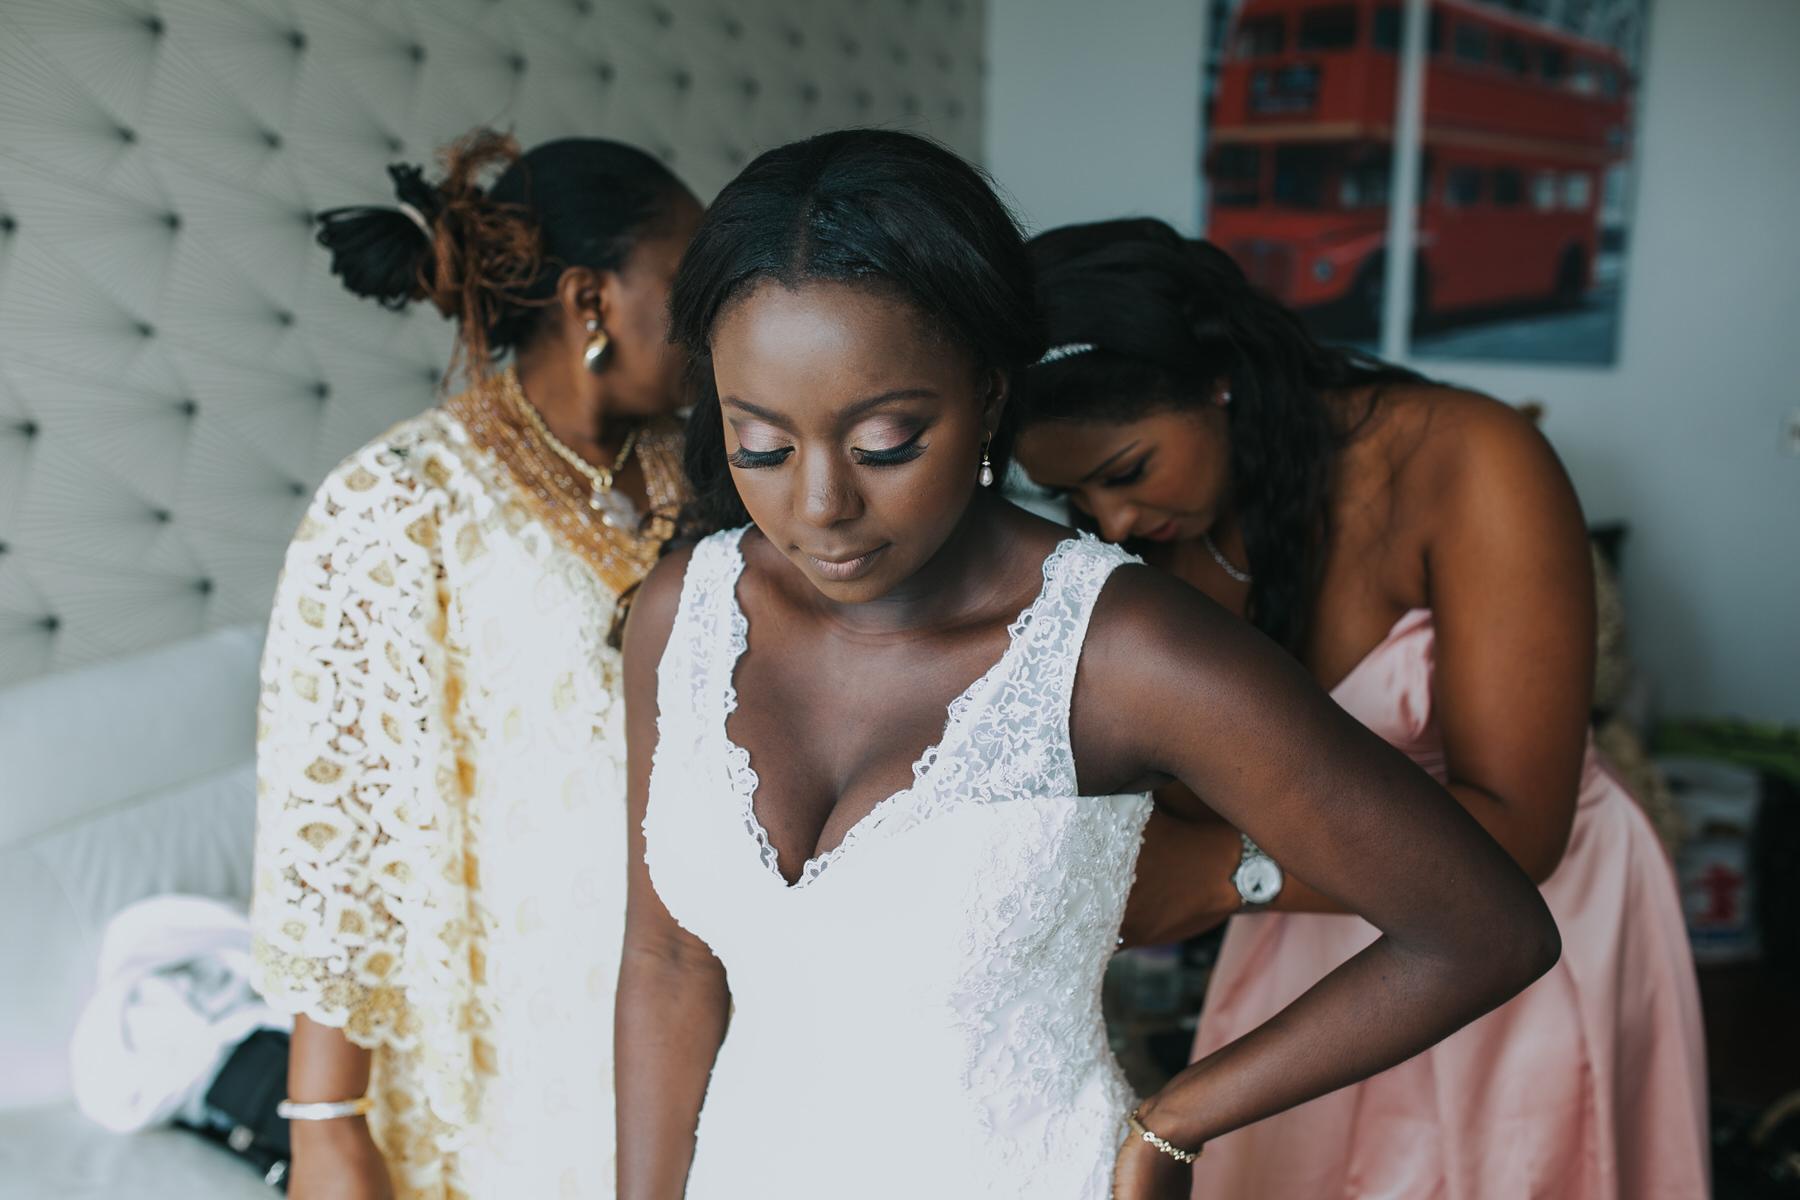 42-bridesmaid adjusting brides dress London wedding photos.jpg